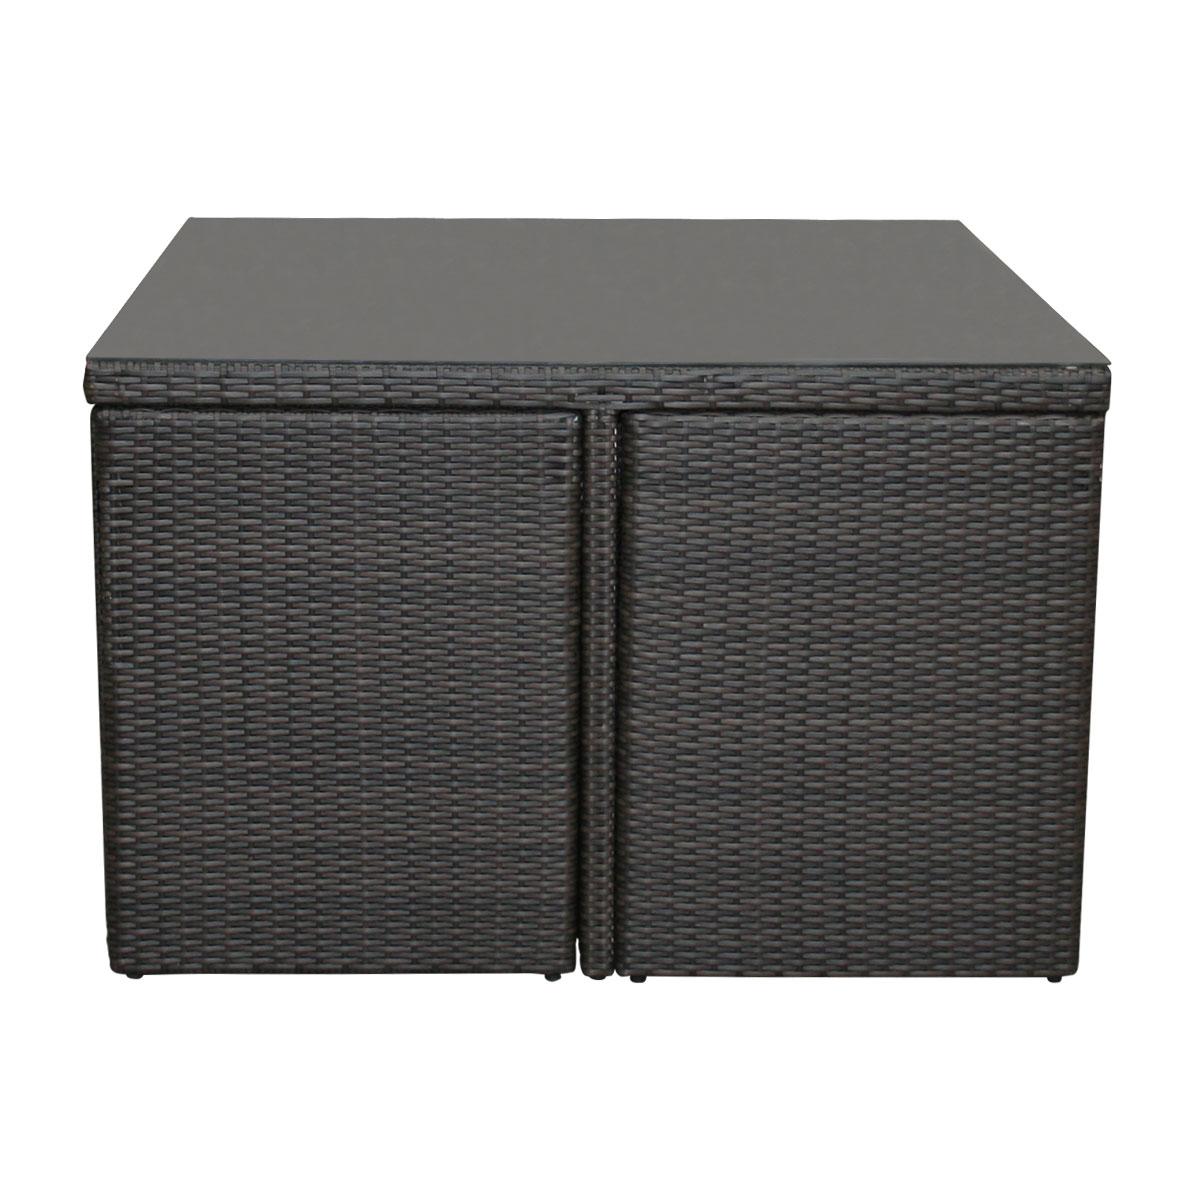 charles bentley wicker rattan 5 piece cube furniture set brown or grey options ebay. Black Bedroom Furniture Sets. Home Design Ideas